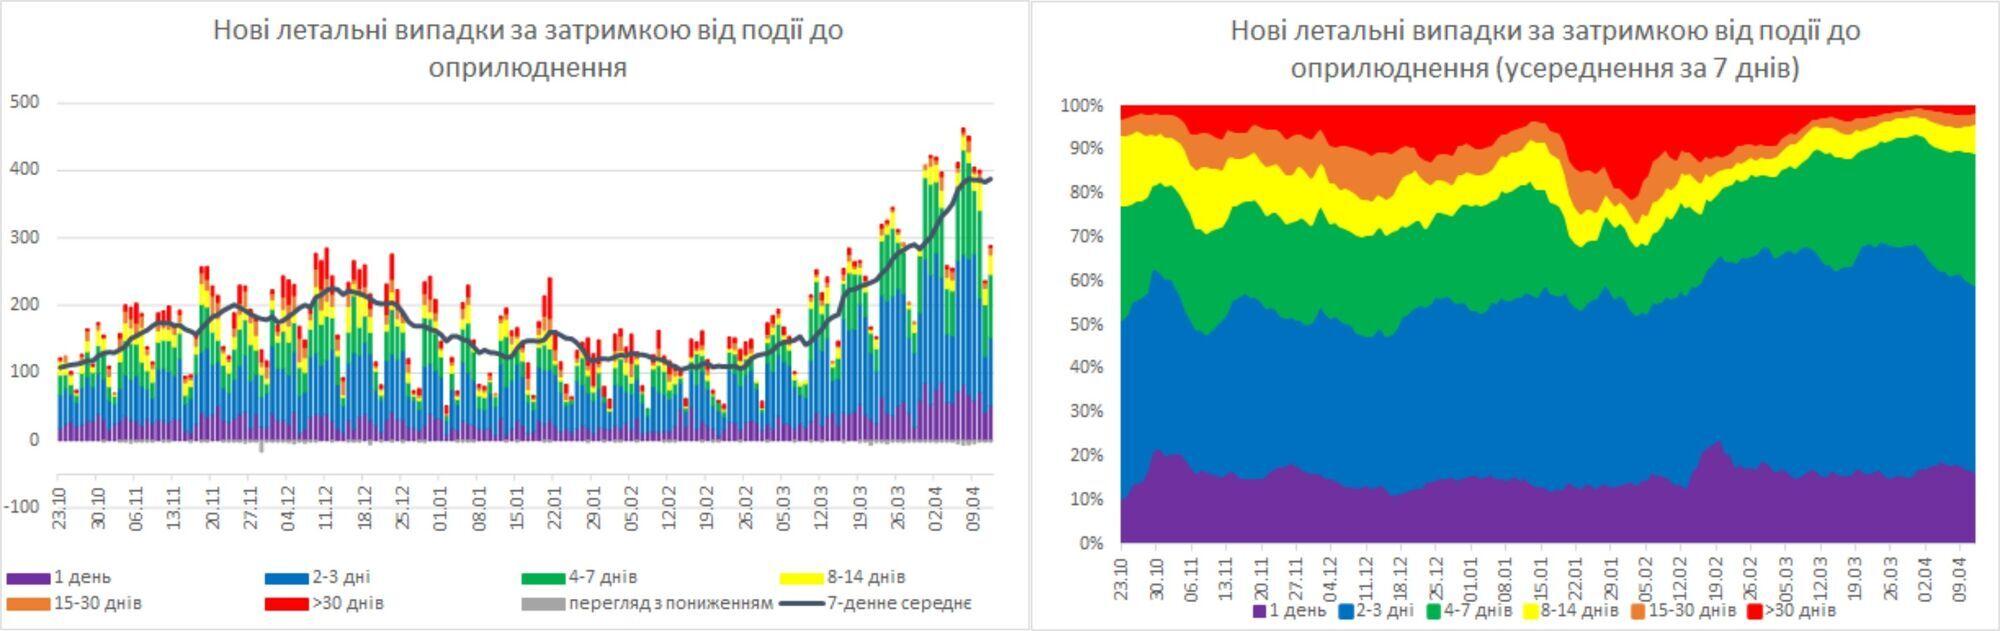 Украина преодолела пик заболеваемости COVID-19, но смертность на спад не пошла – НАН